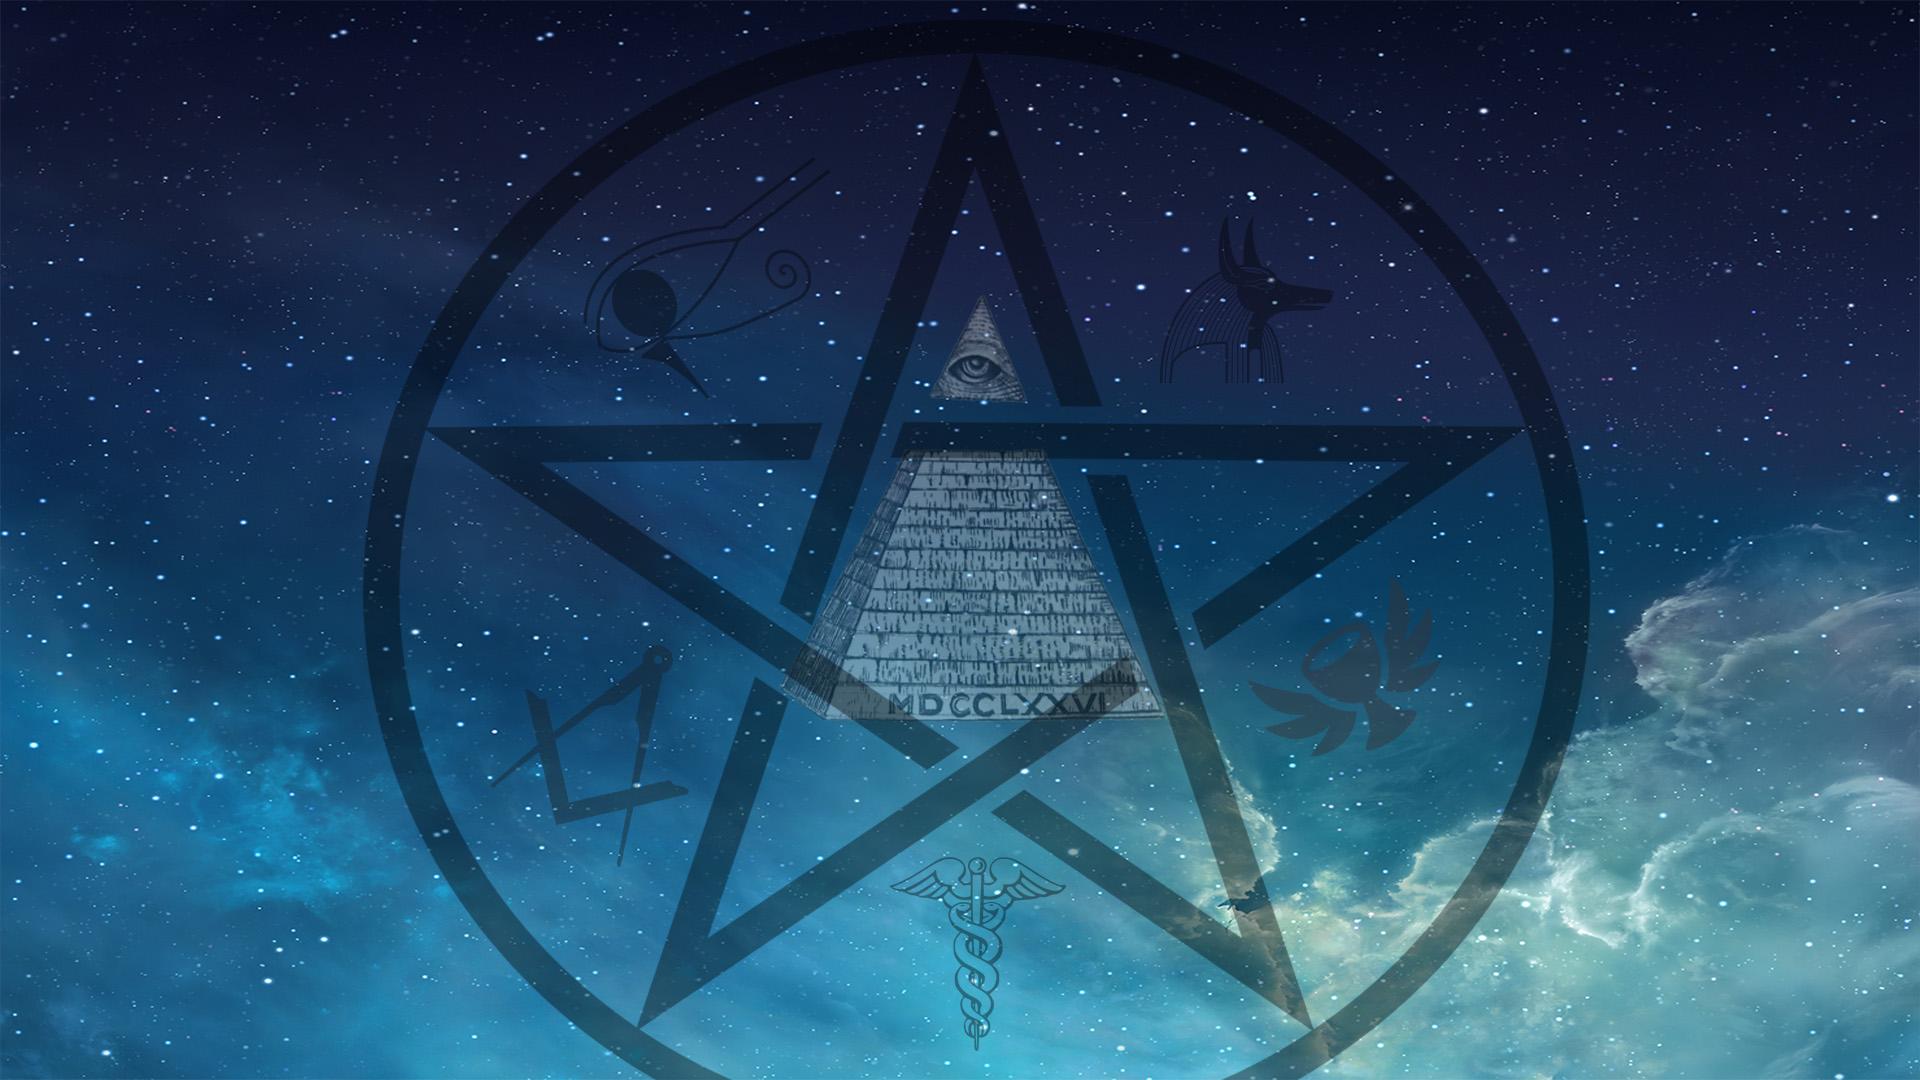 illuminati wallpaper by unkelben by unkelben on deviantart